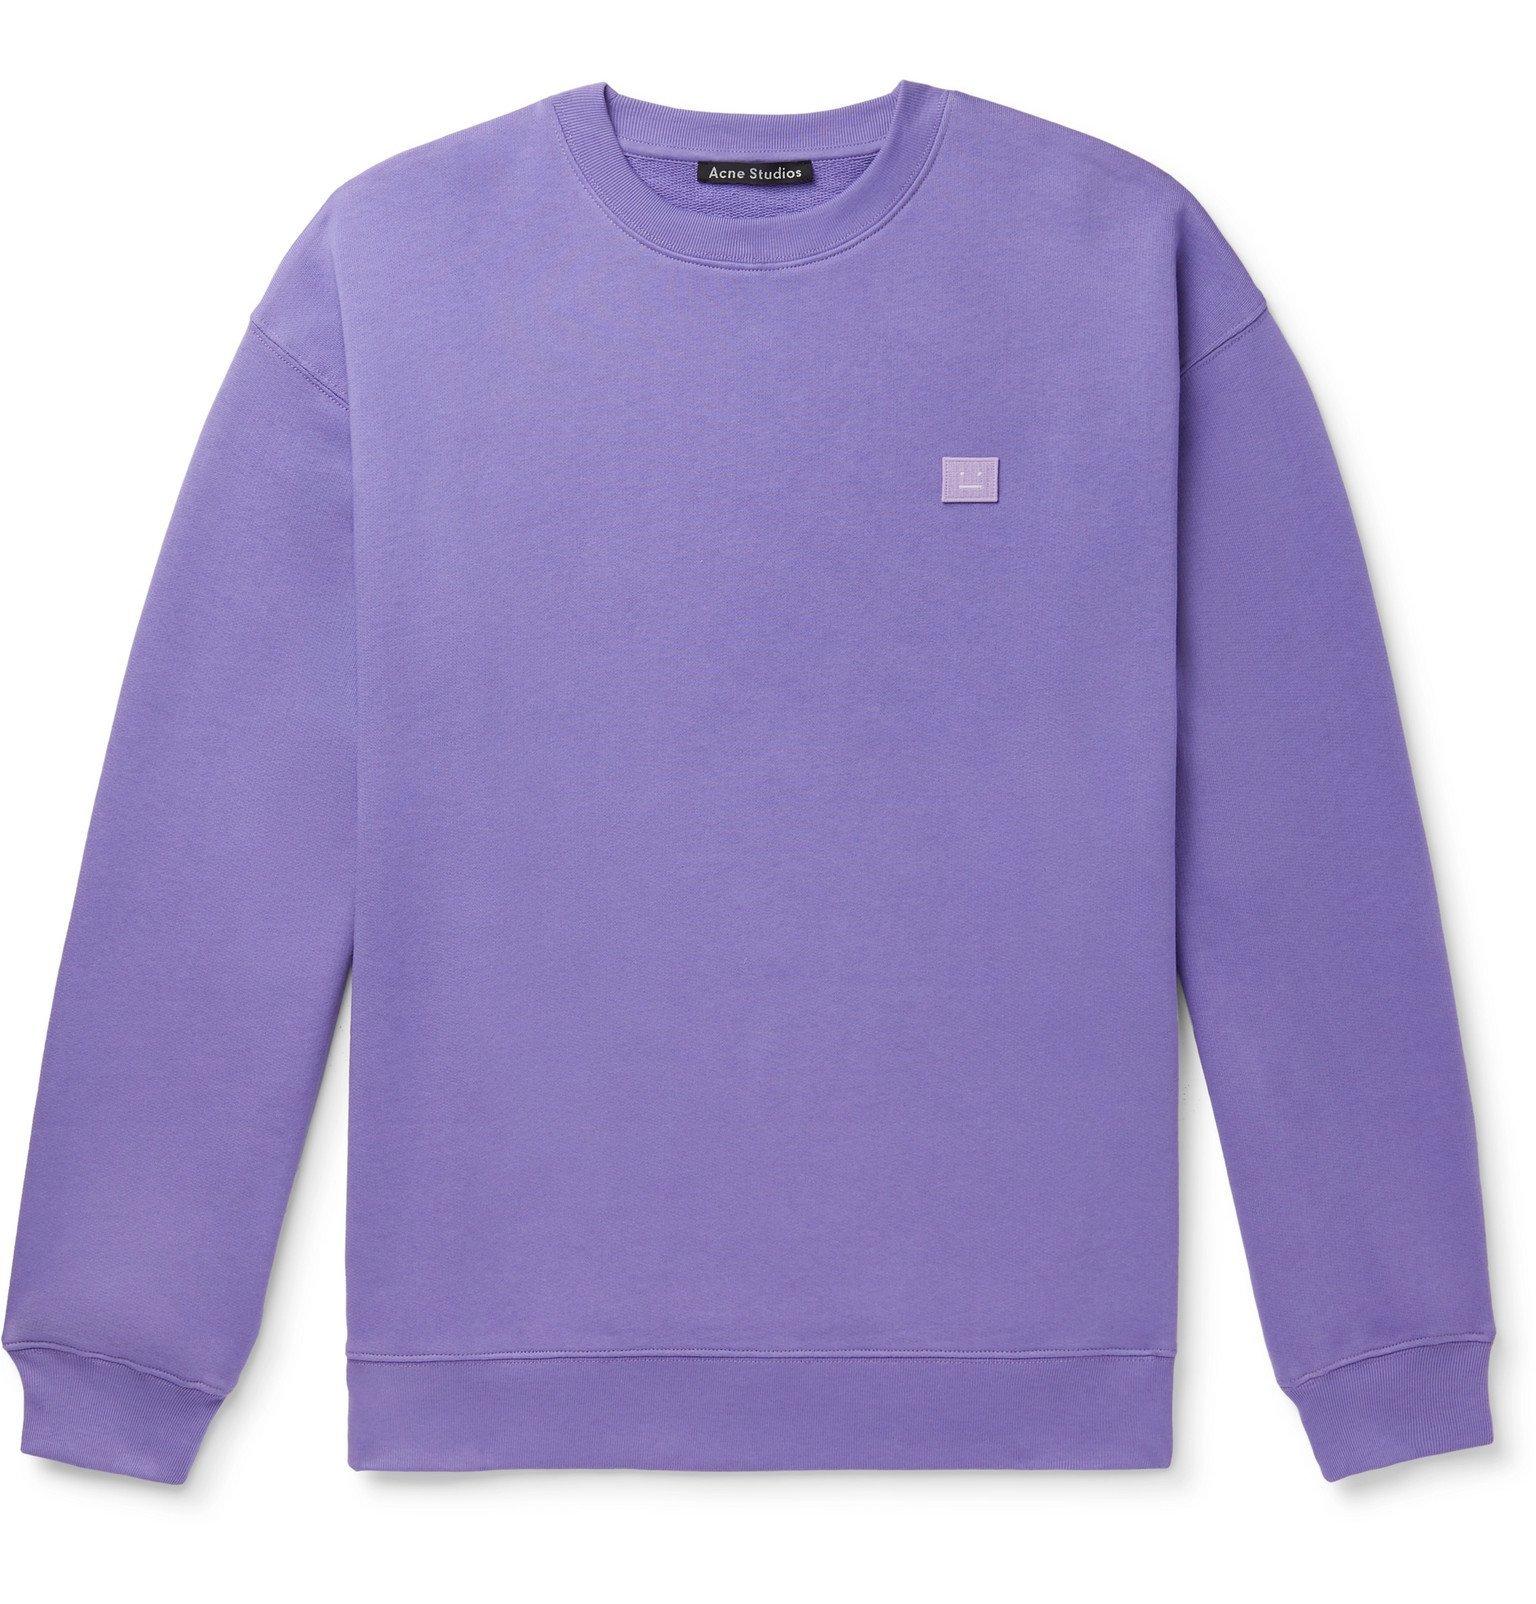 Acne Studios - Forba Oversized Logo-Appliquéd Mélange Loopback Cotton-Jersey Sweatshirt - Purple